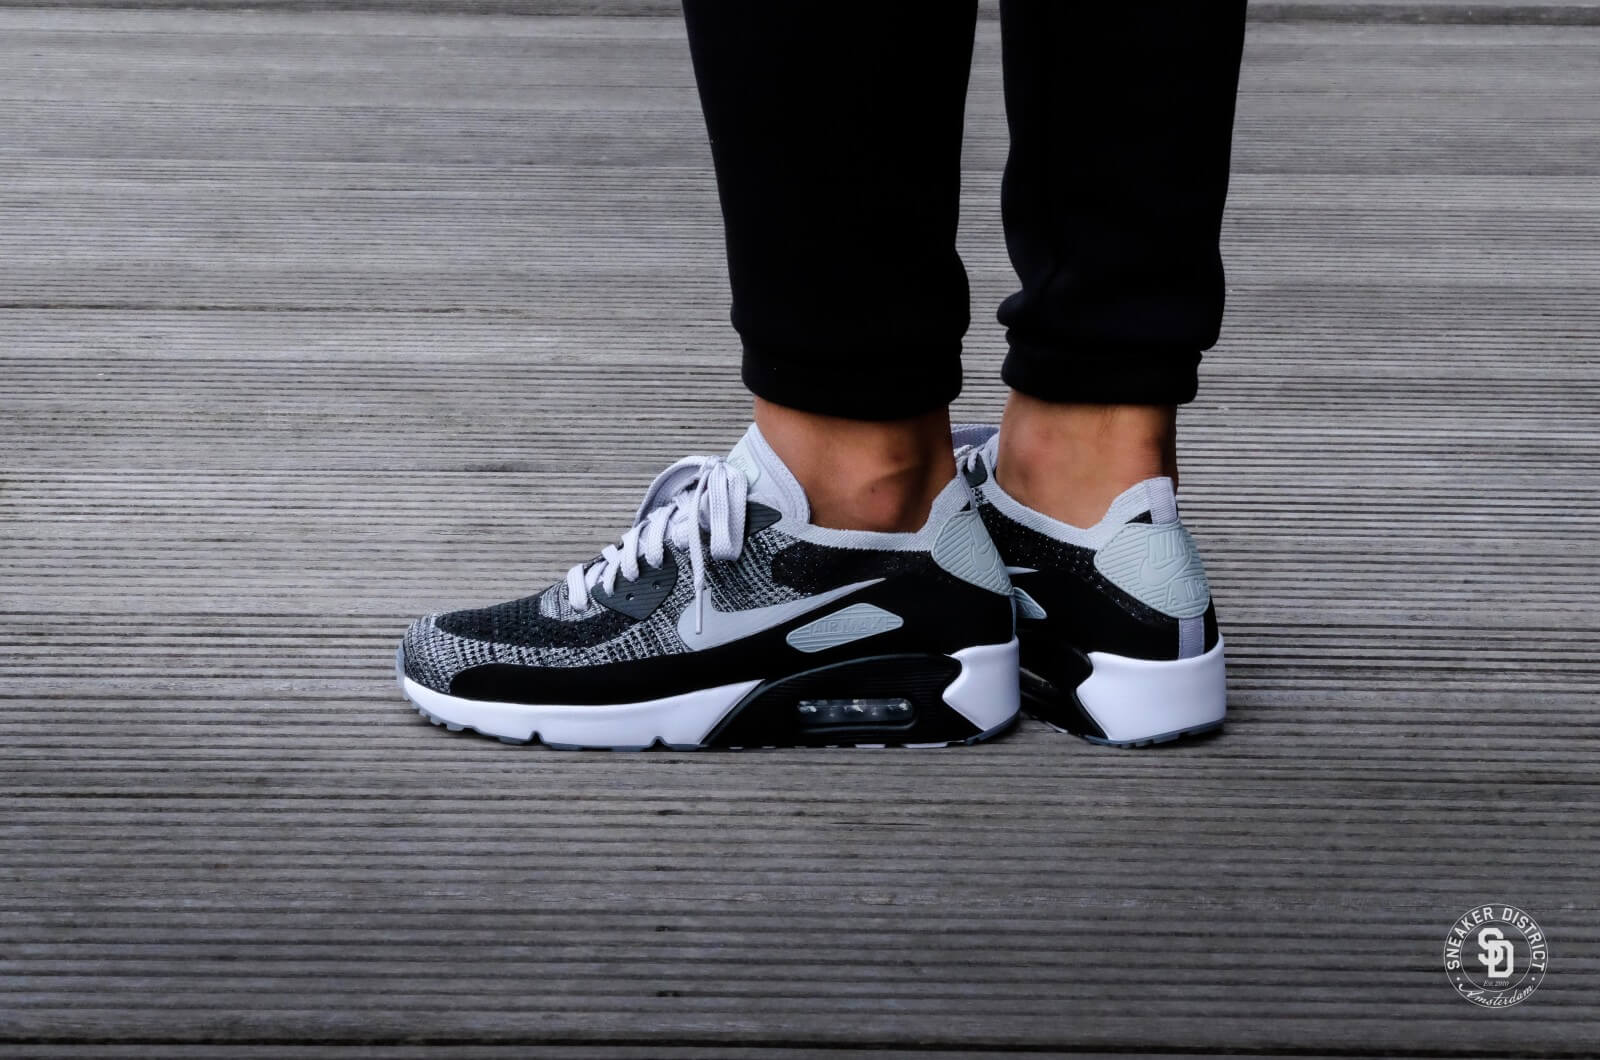 Nike Air Max 90 Ultra 2.0 Flyknit Cool Grey Sneaker